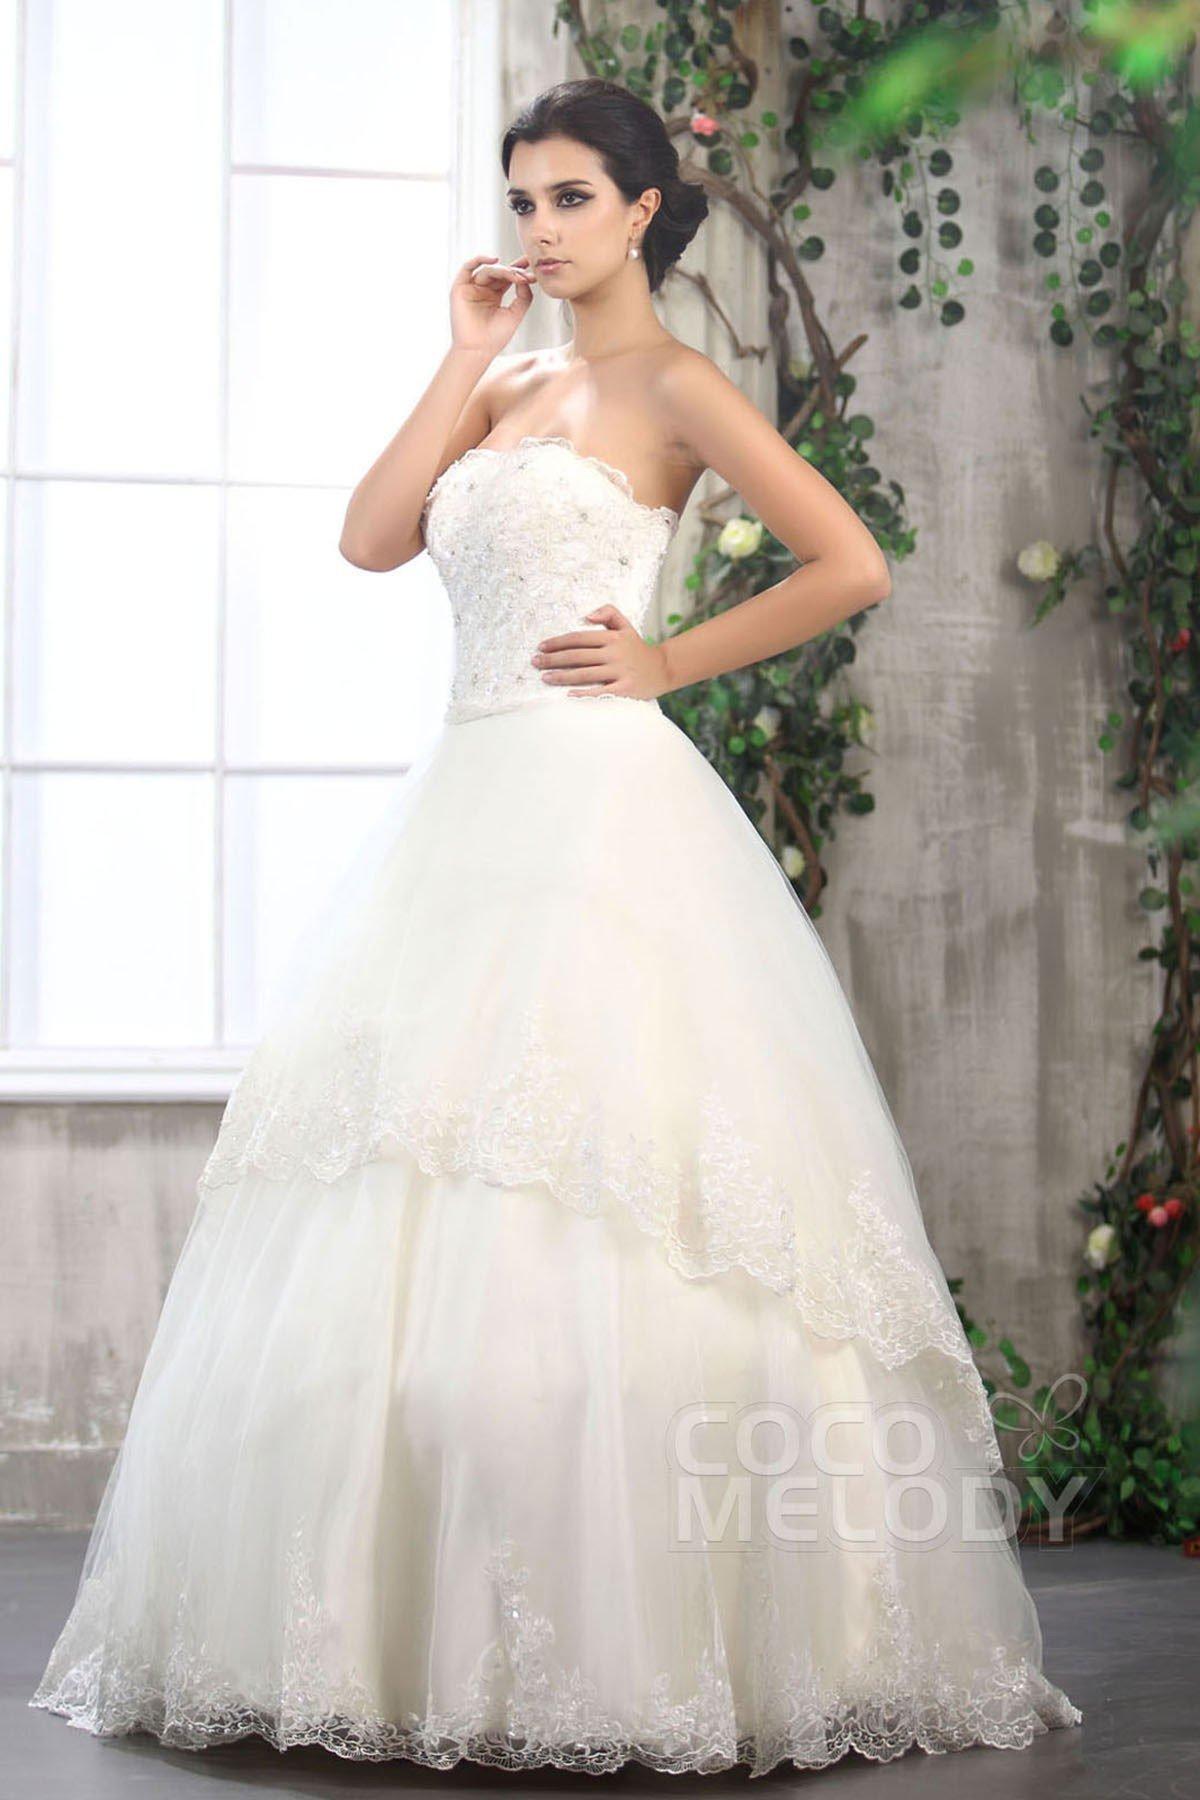 Trendy A-Line Strapless Floor Length Tulle Wedding Dress CWLF13010